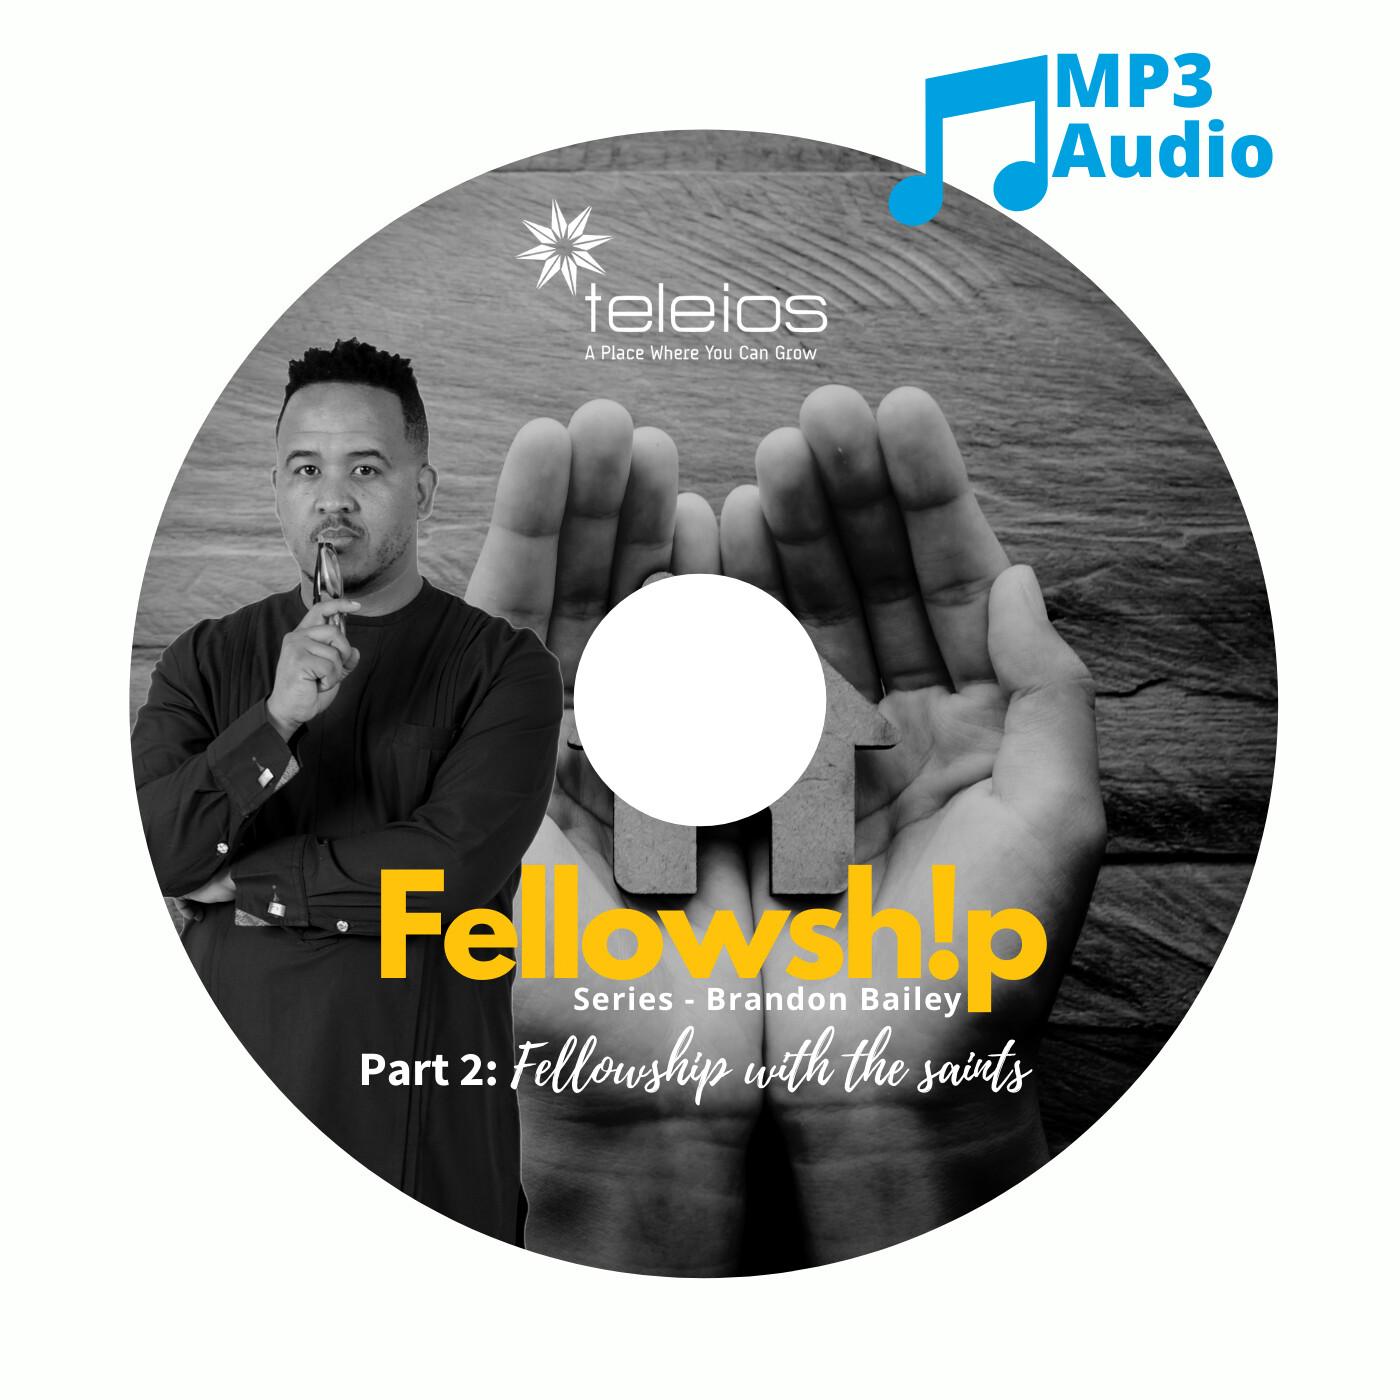 Fellowship Part 2: Fellowship with the saints